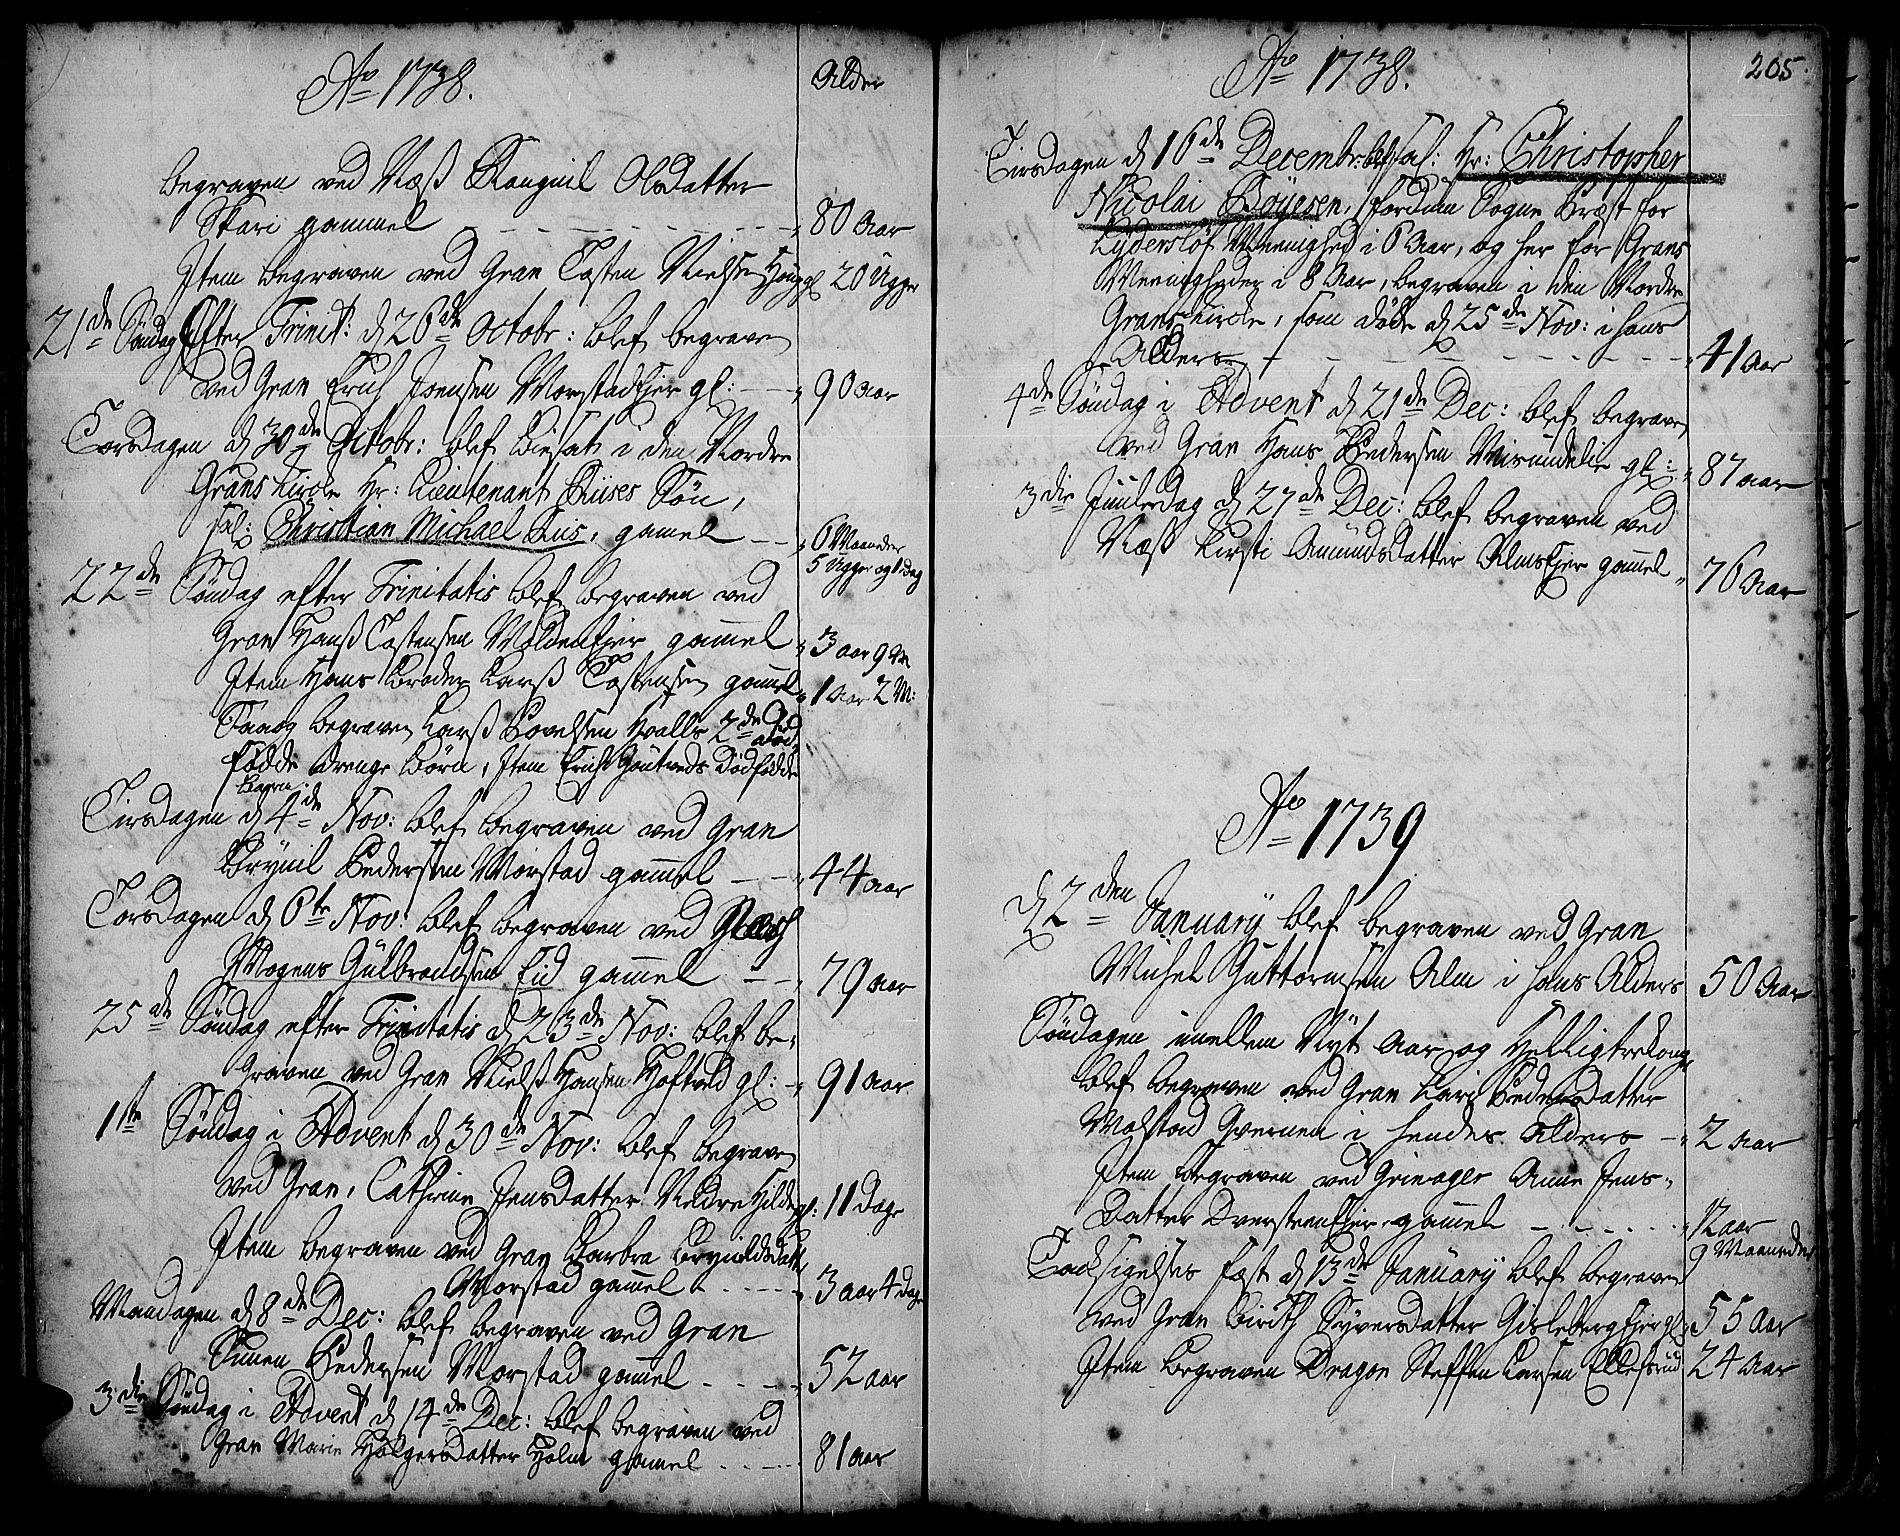 SAH, Gran prestekontor, Ministerialbok nr. 2, 1732-1744, s. 205